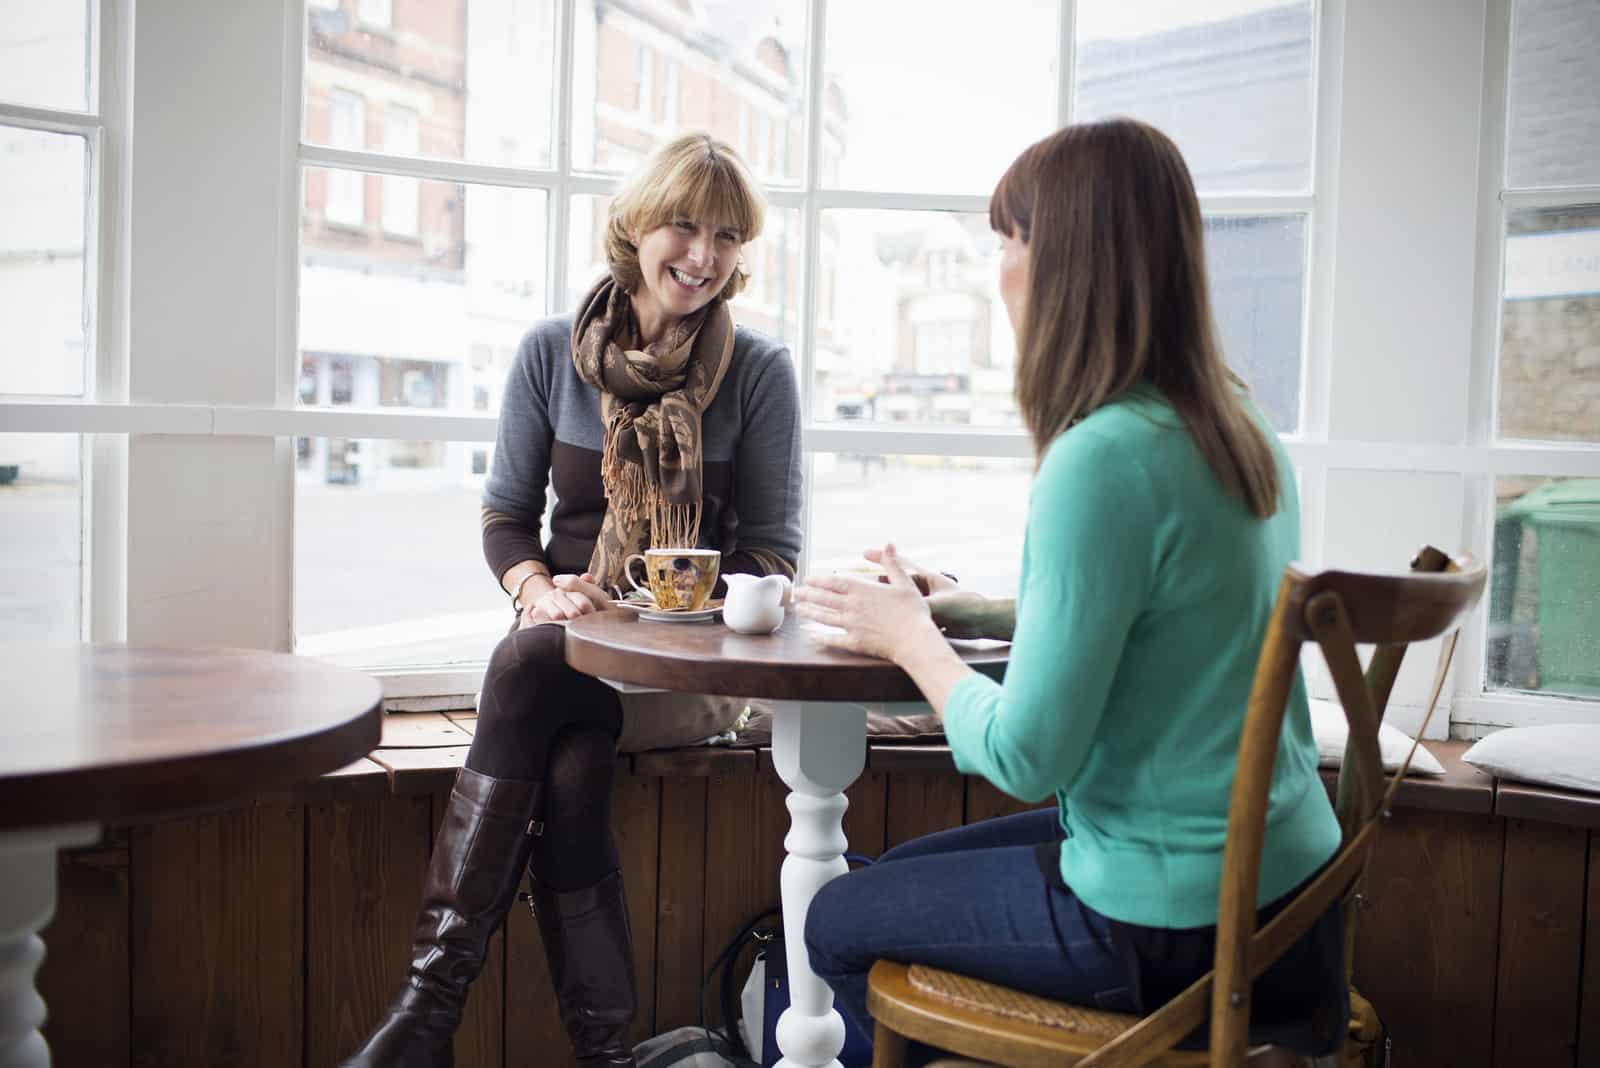 Zwei reife Freundinnen treffen sich im Café